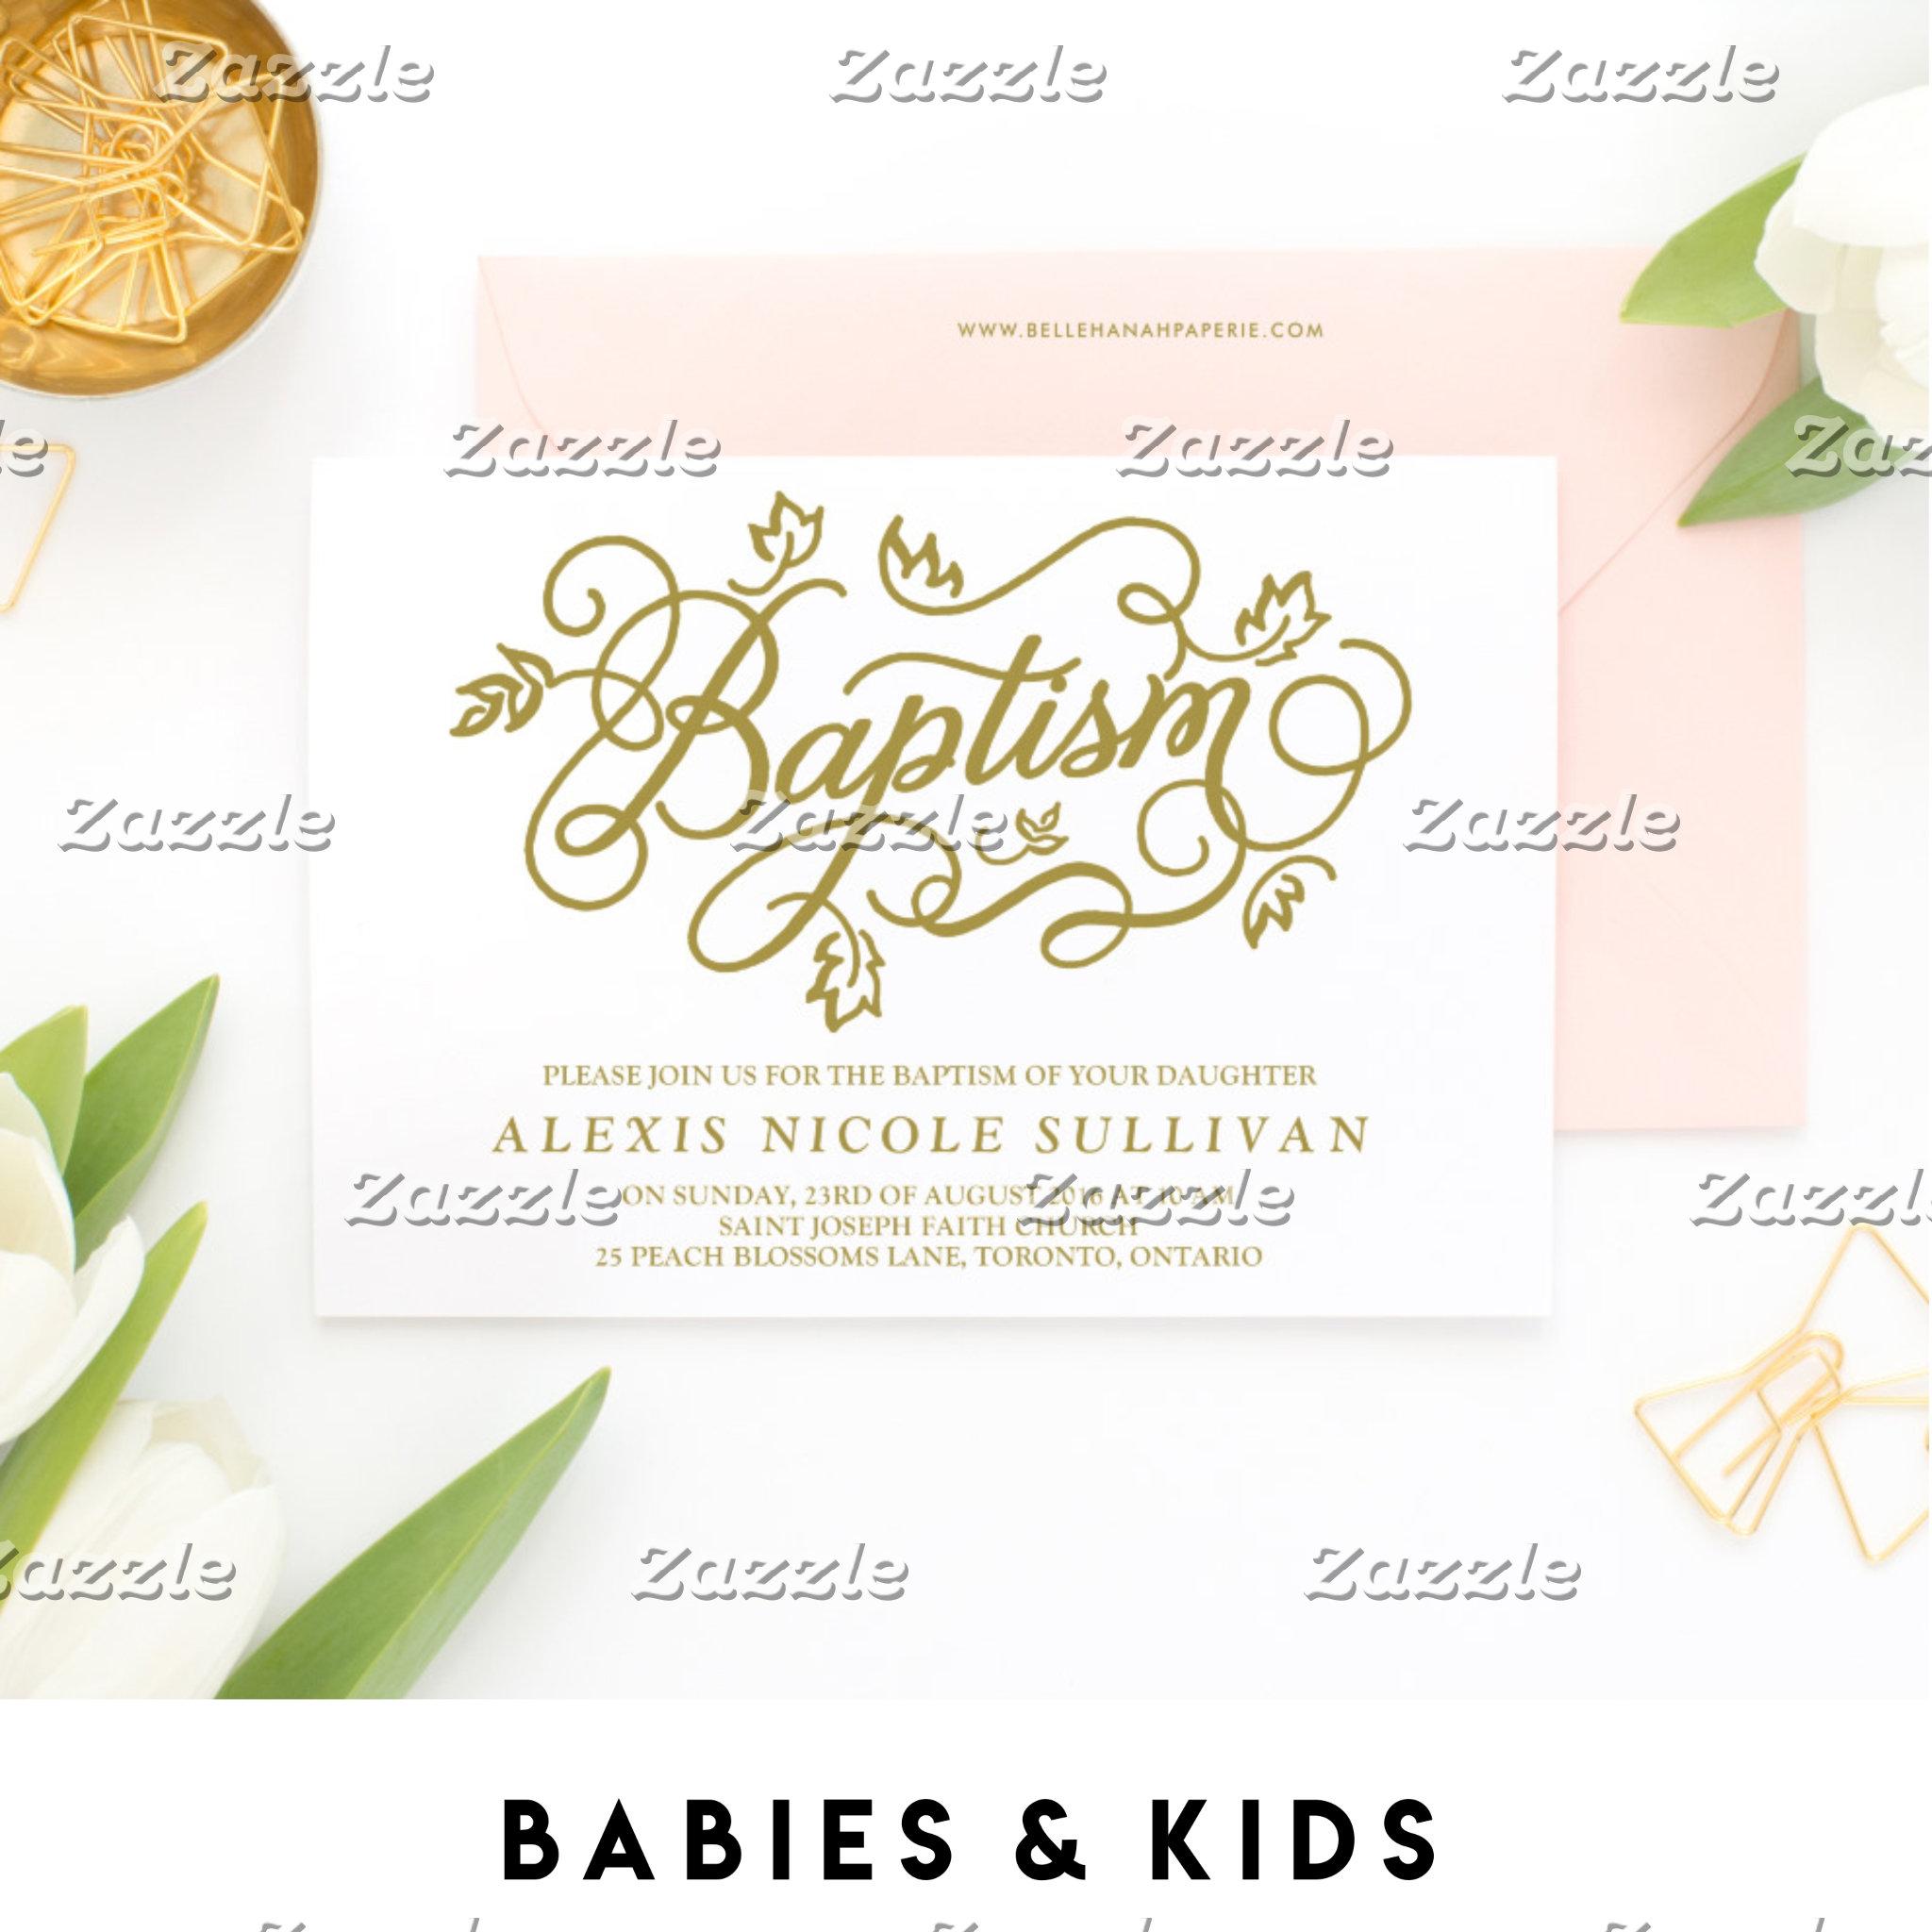 BABIES + KIDS